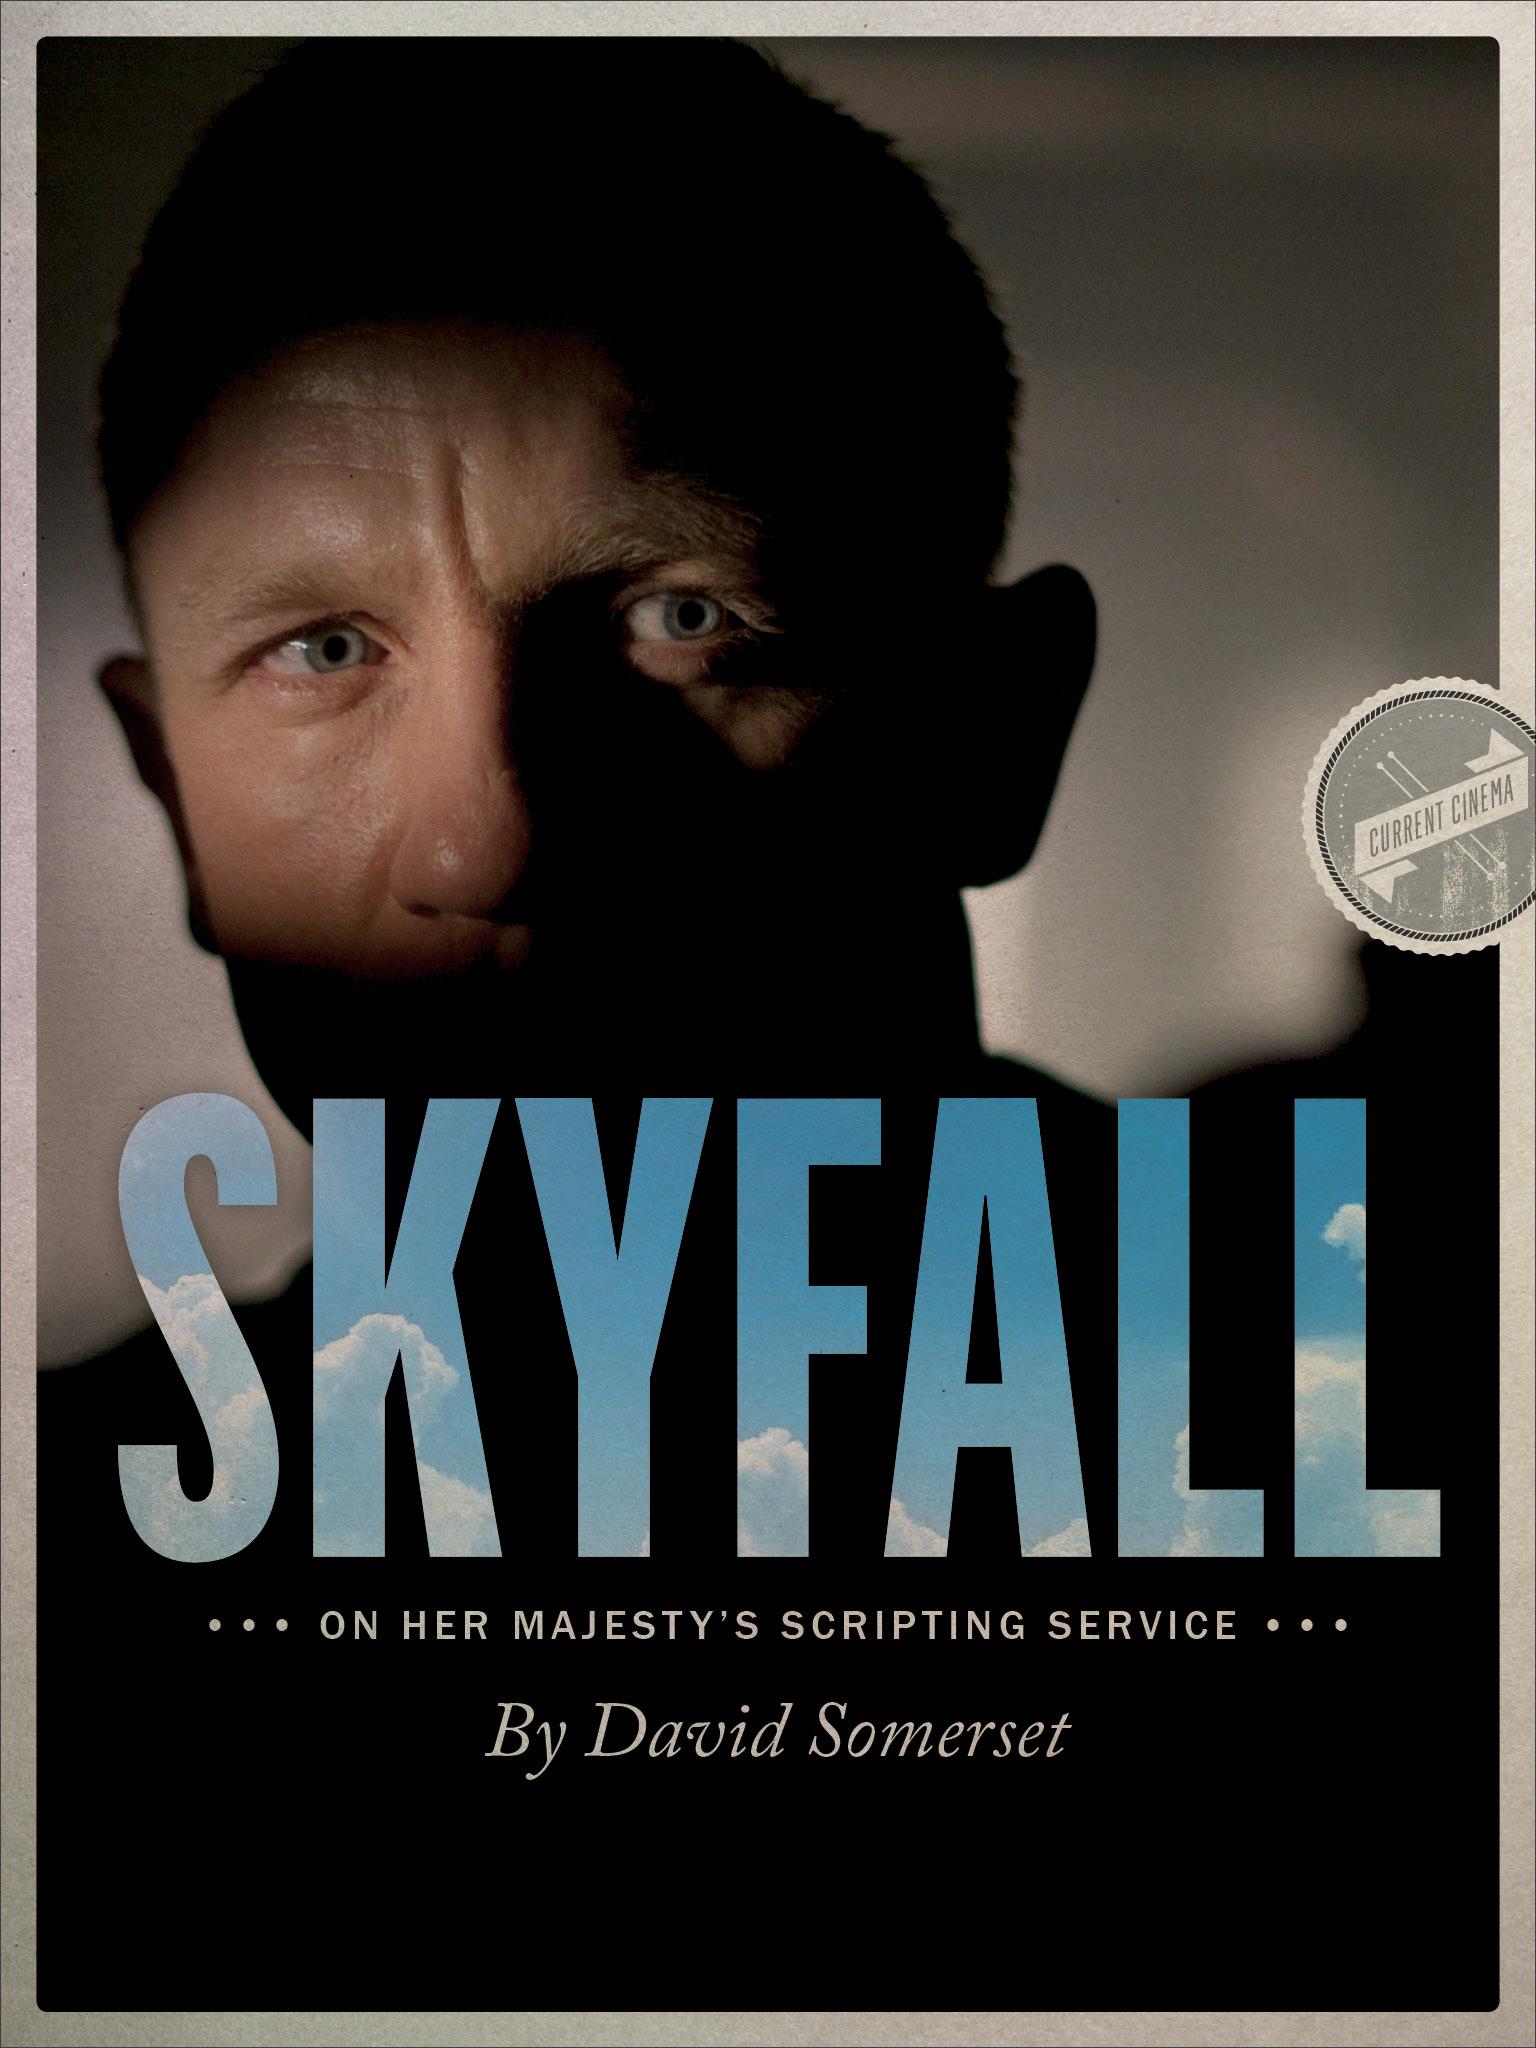 Skyfall layout